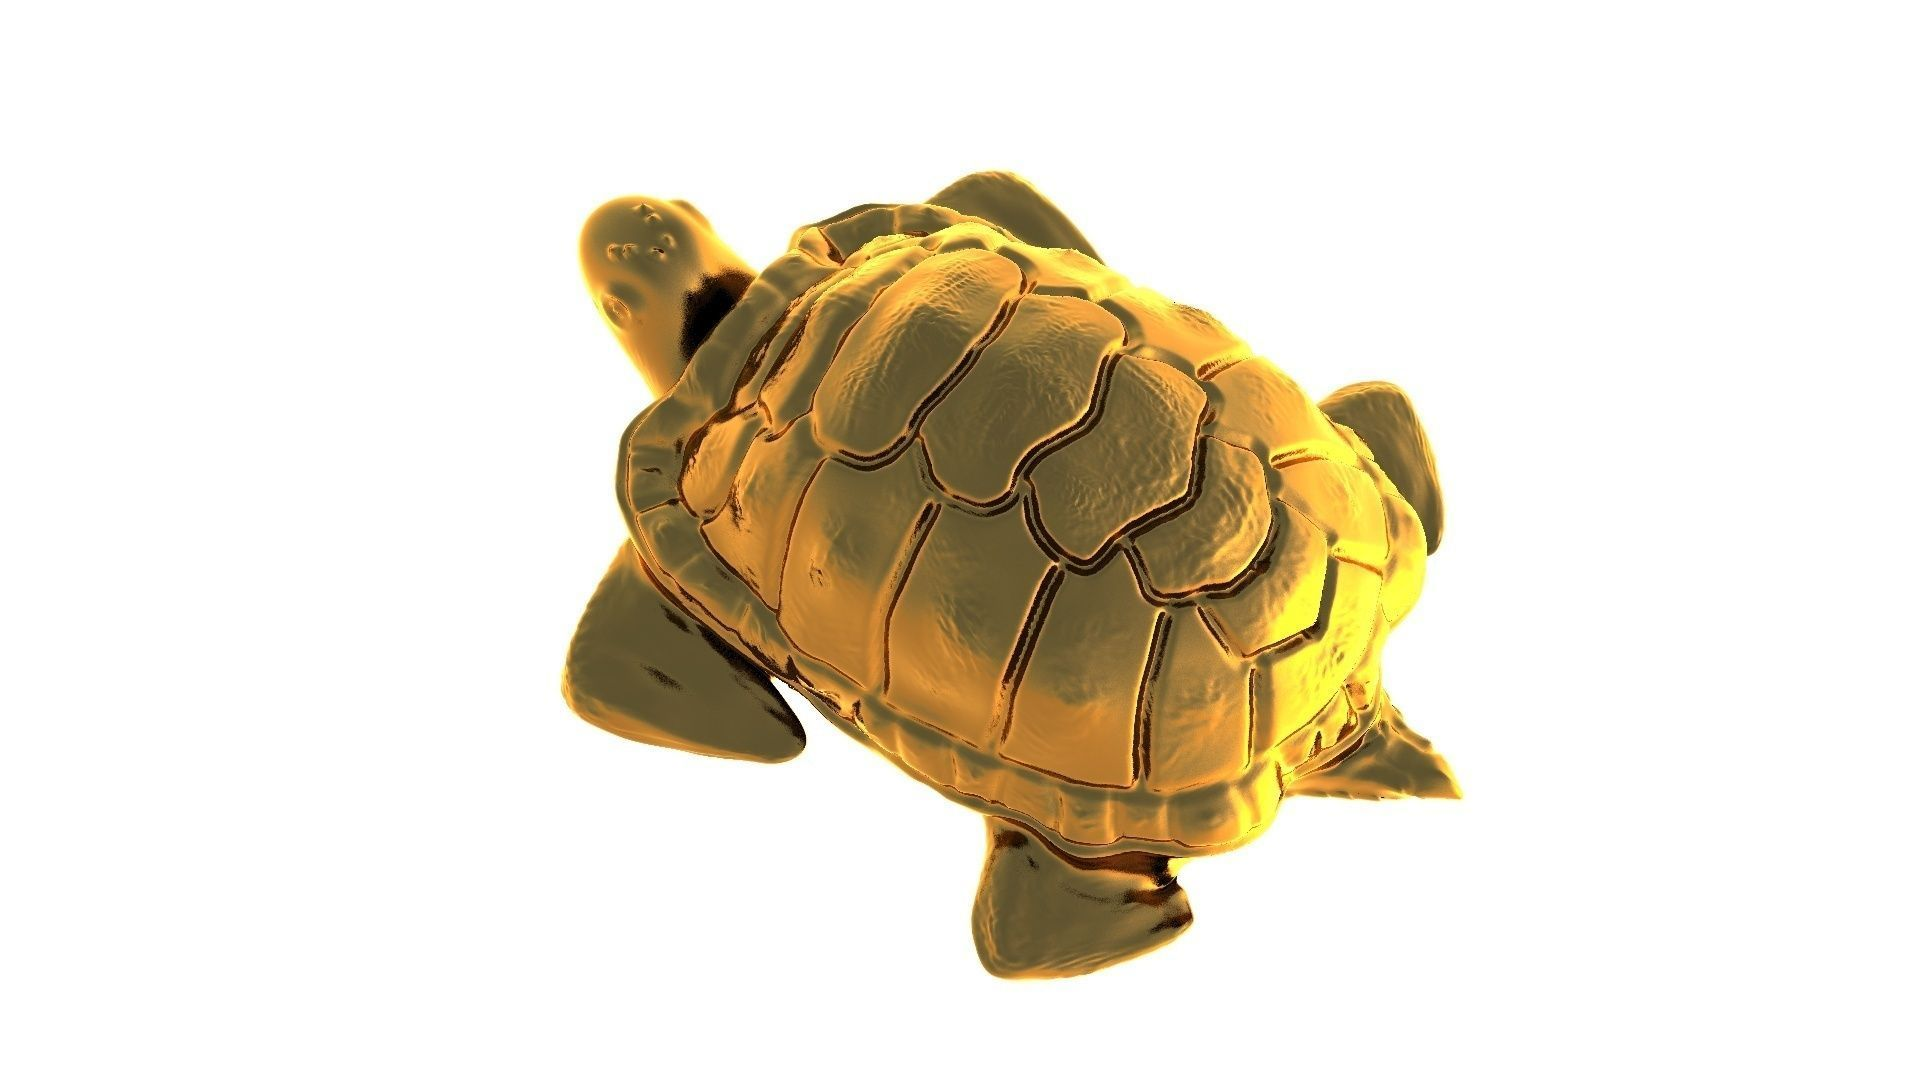 turtle 3d print 3d model 3d printable obj stl